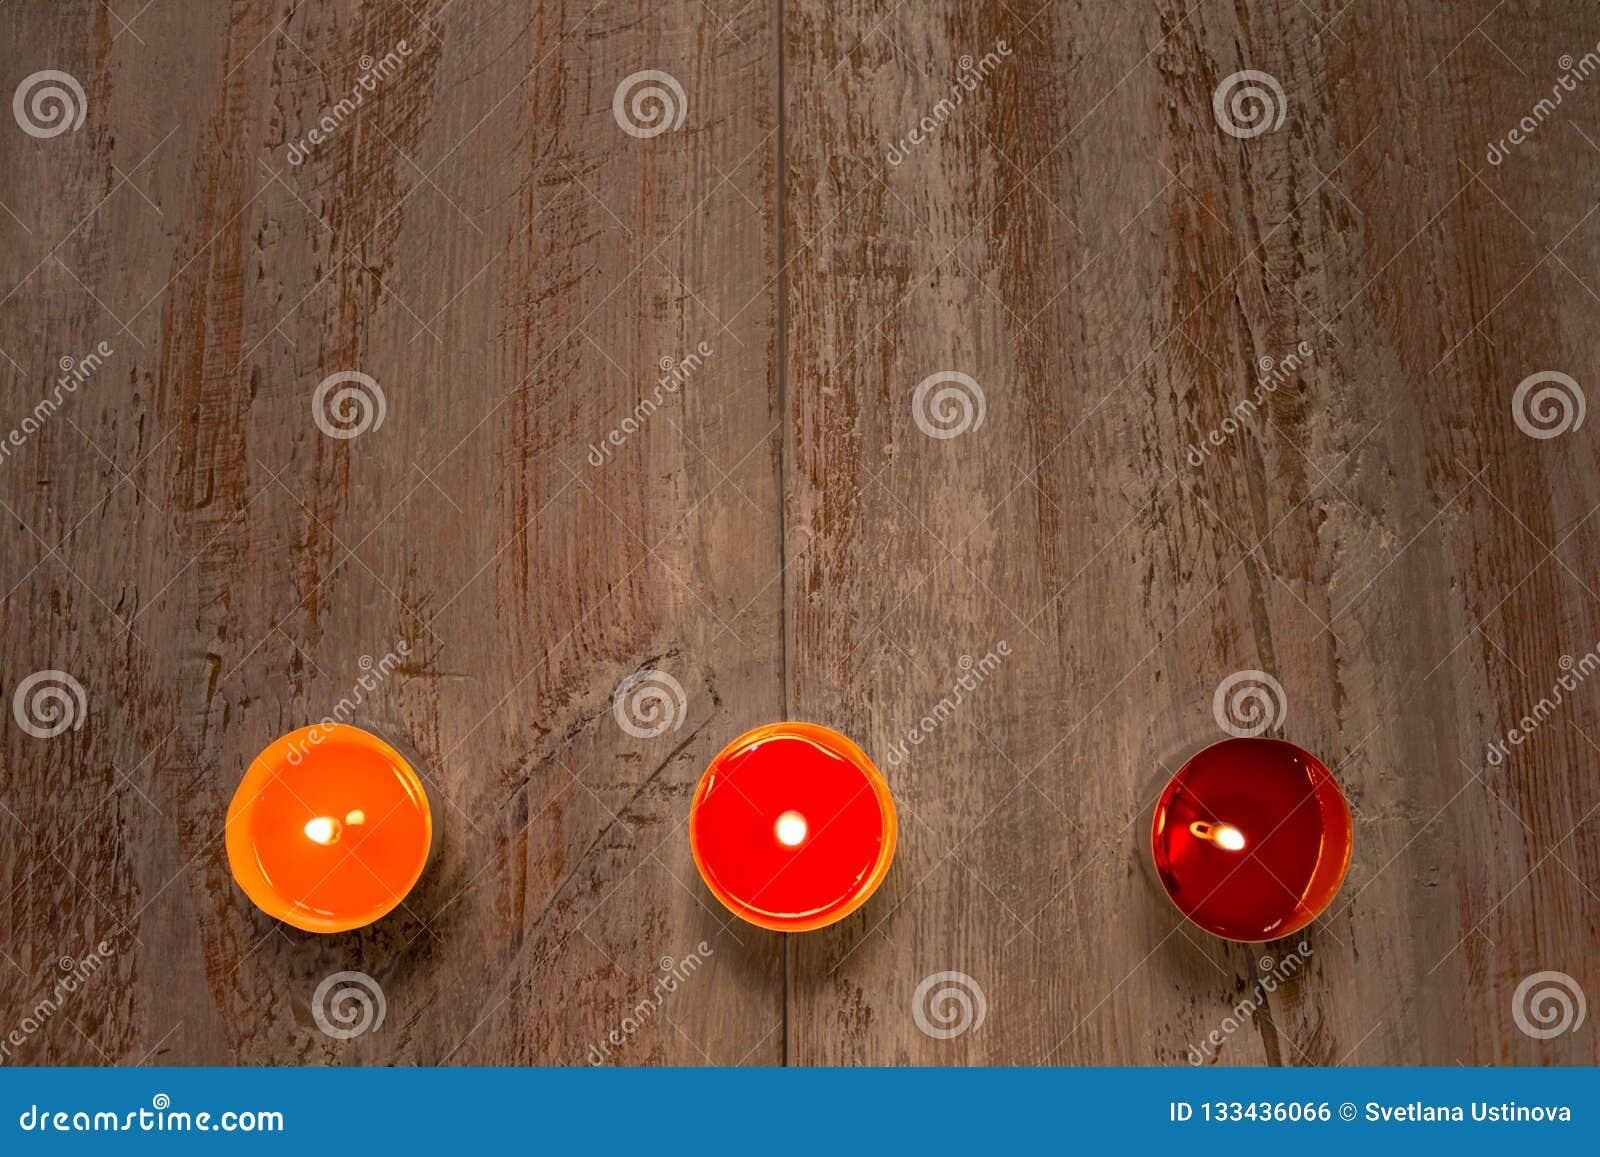 Färgrika stearinljus på träbrädena